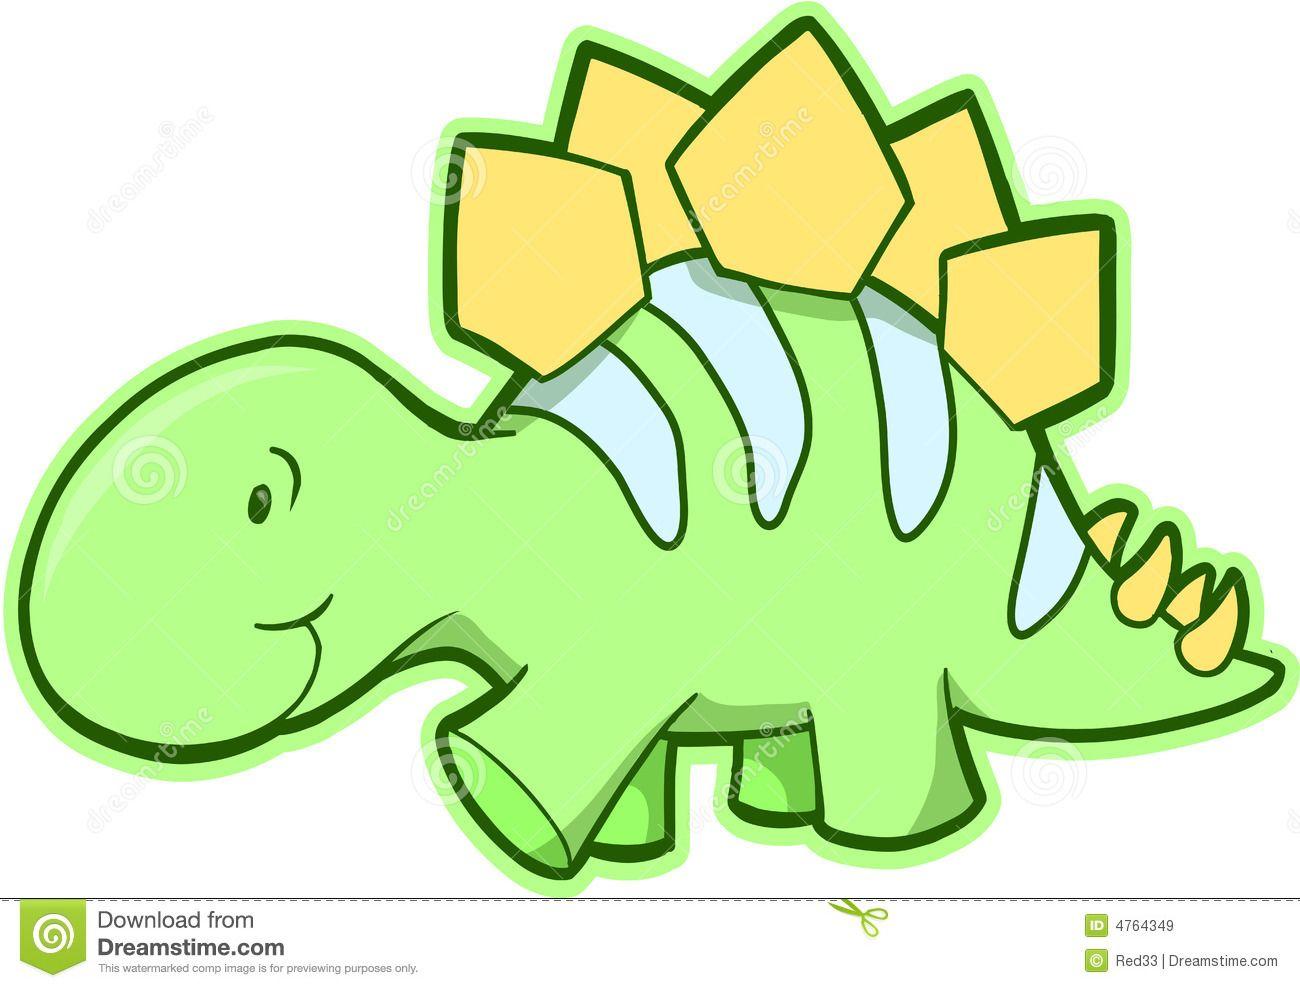 dinossauro cute pesquisa google royalty free photos cute dinosaur free stock image  [ 1300 x 988 Pixel ]